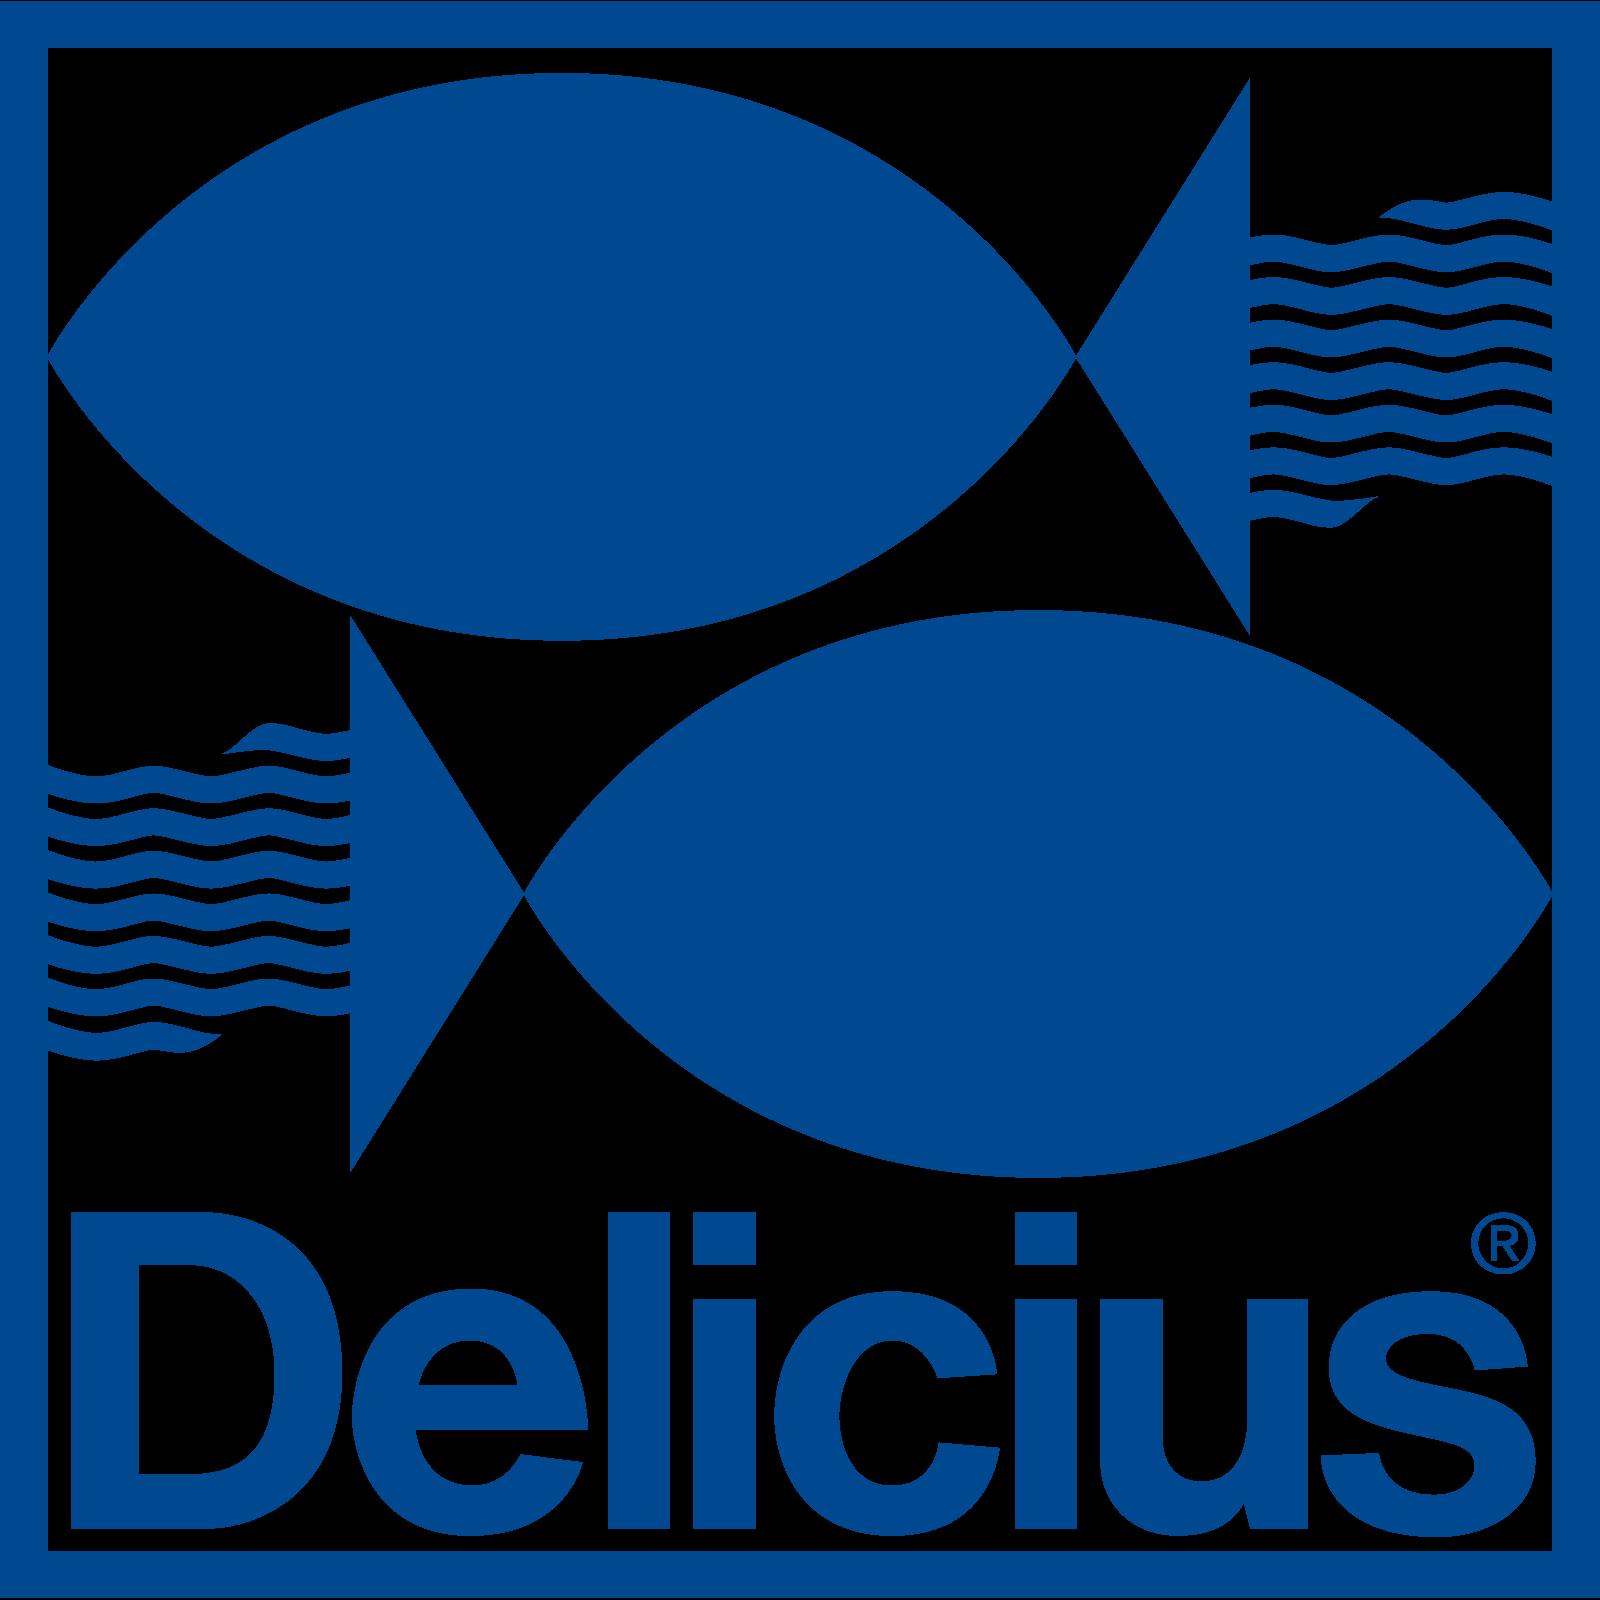 Delicius